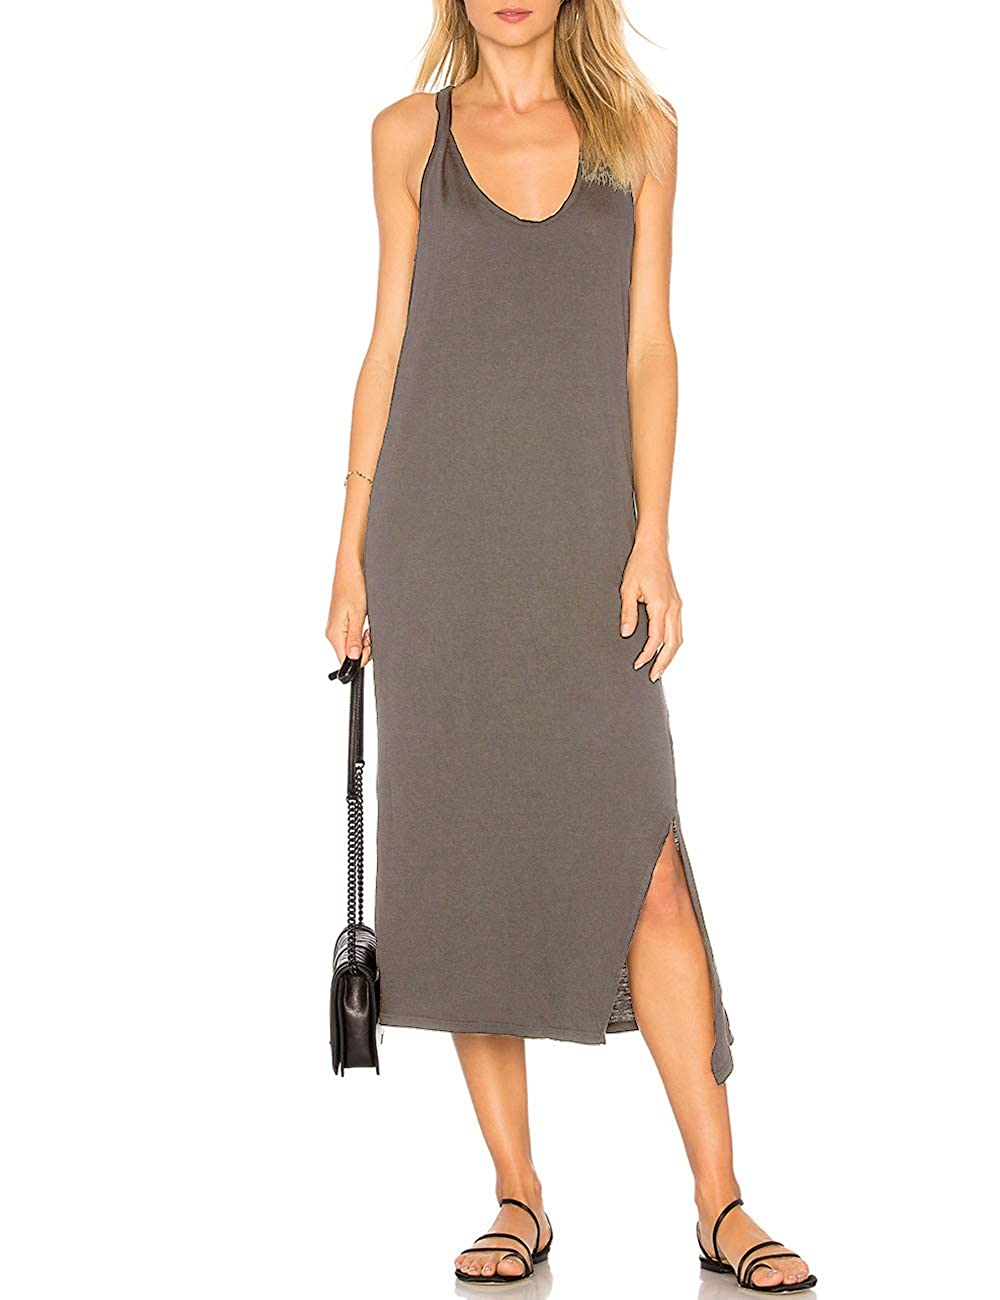 cd44d8cf6615 ALLY-MAGIC Womens Sleeveless Side Split Long Dress Casual Tank T-Shirt Midi  Dresses at Amazon Women s Clothing store